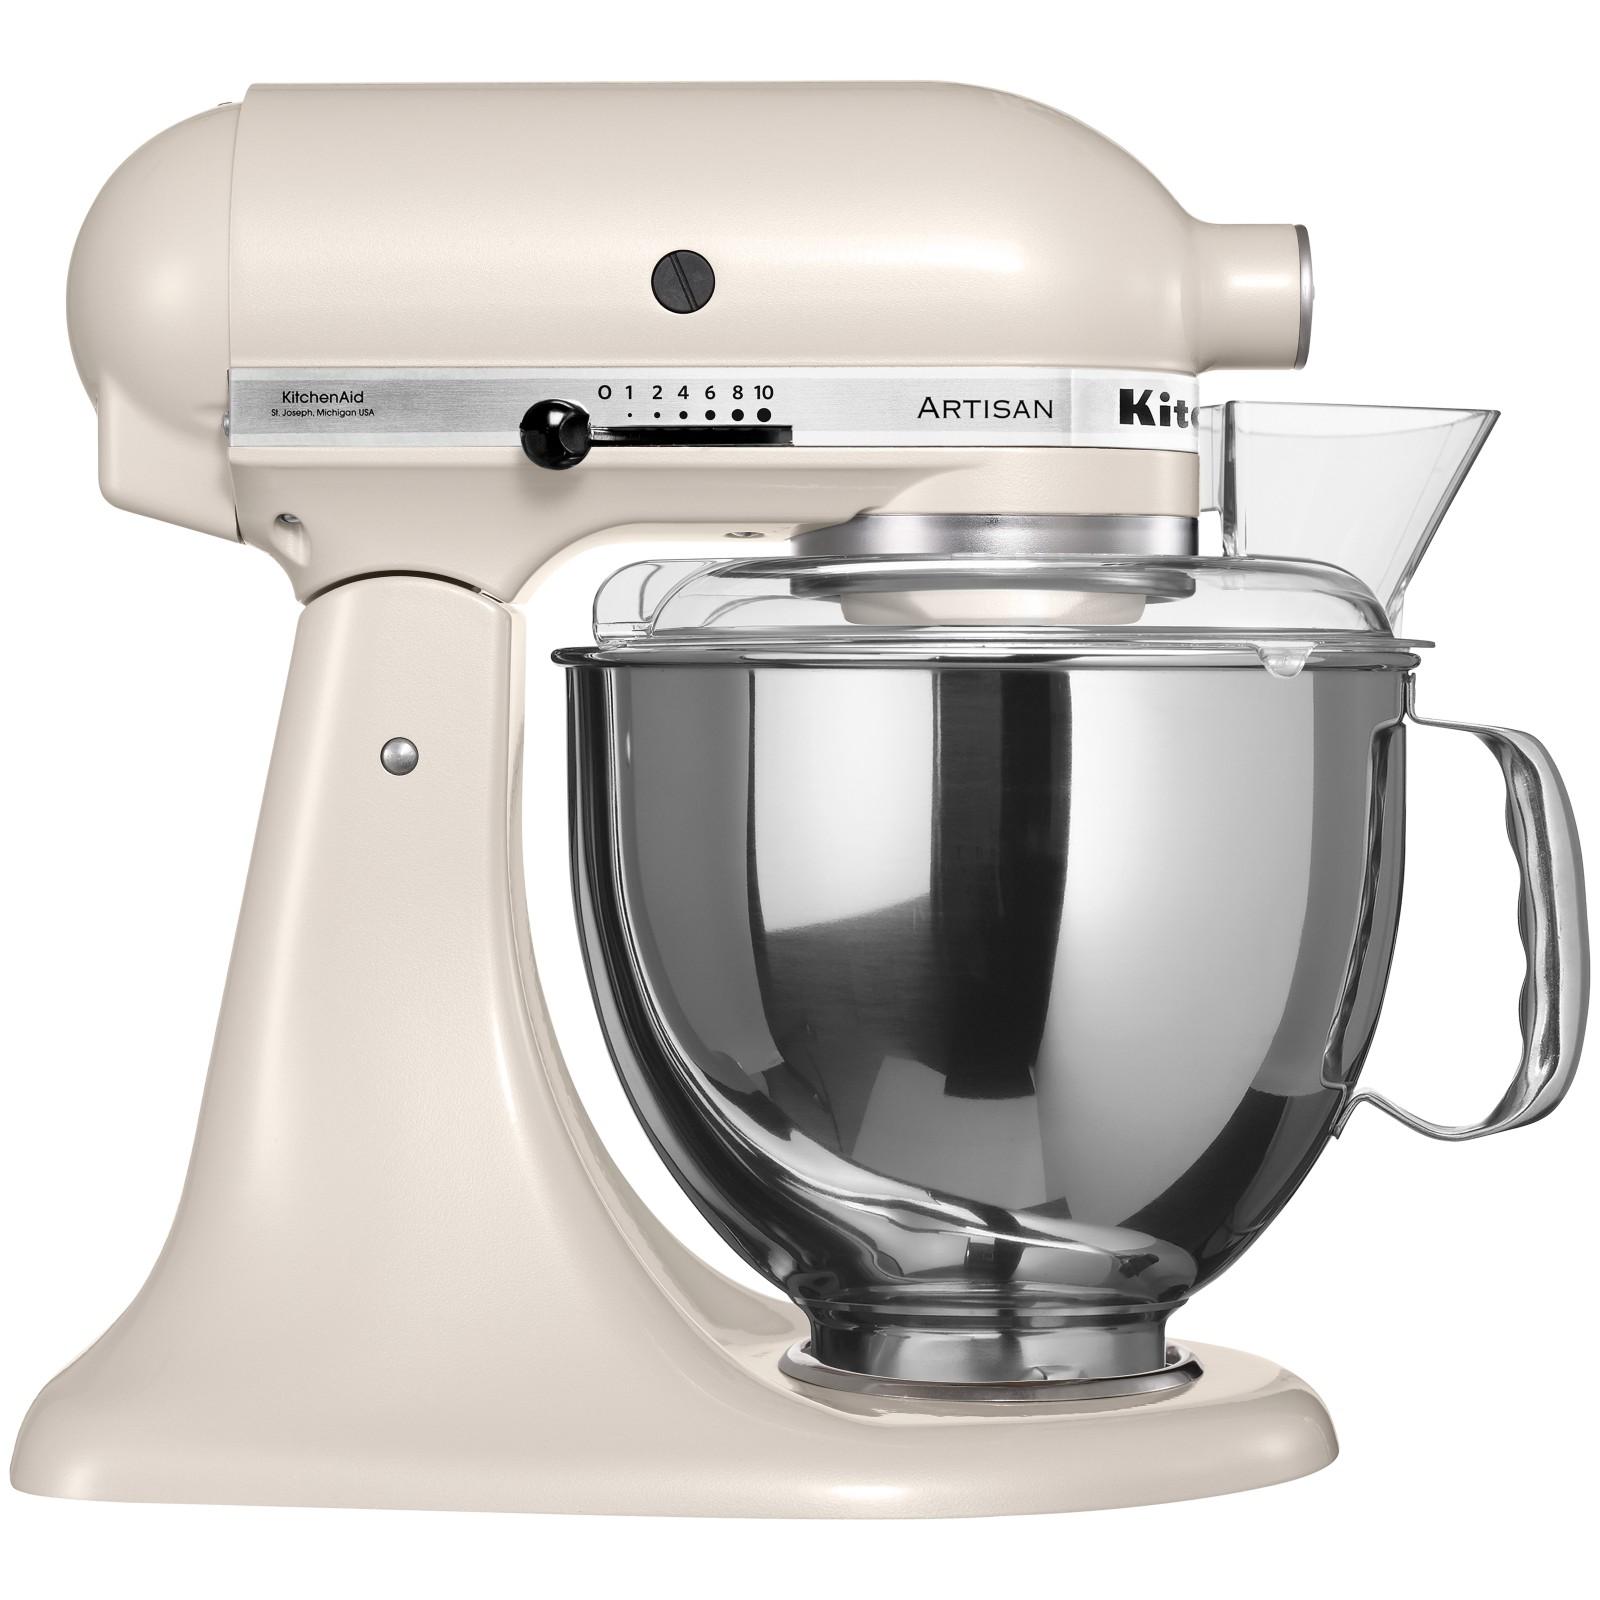 KitchenAid Artisan 4.8L Stand Mixer Café Latte